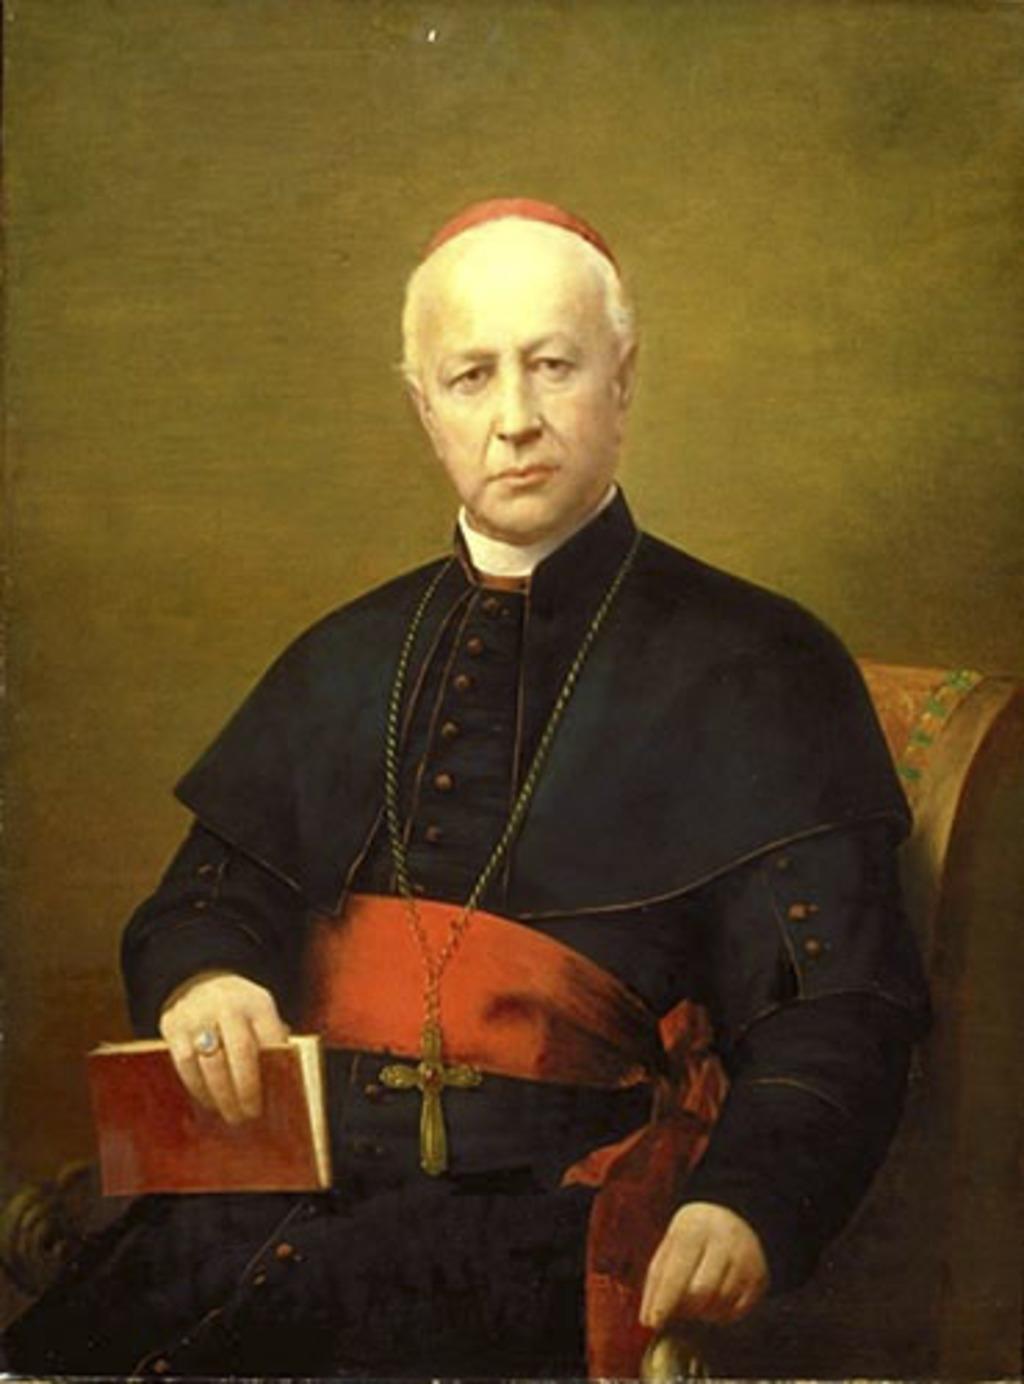 Le Cardinal Elzéar-Alexandre Taschereau